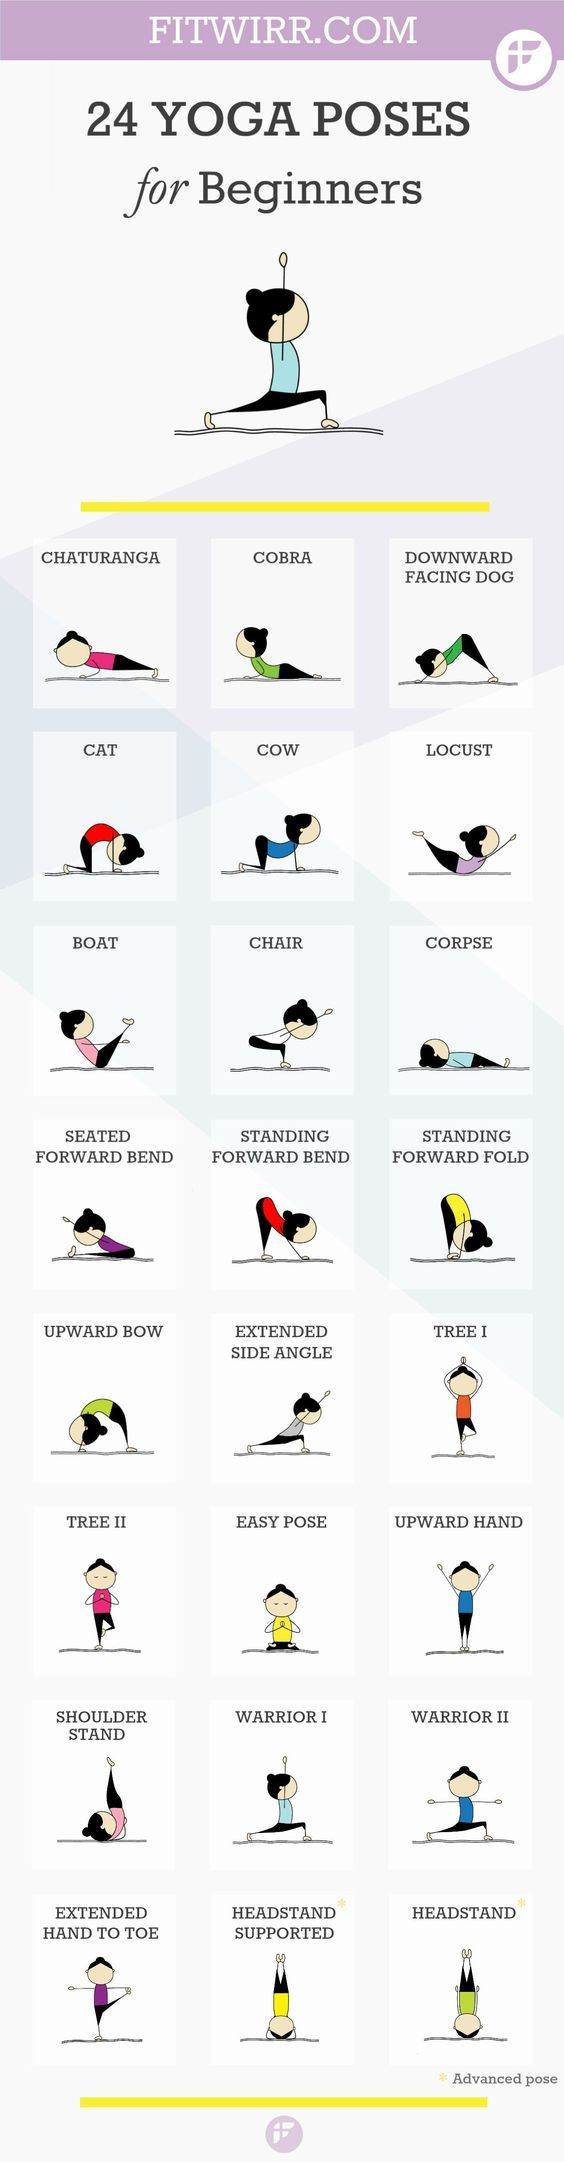 24 Yoga poses for beginners. Namaste :-). #yoga #meditation #health: